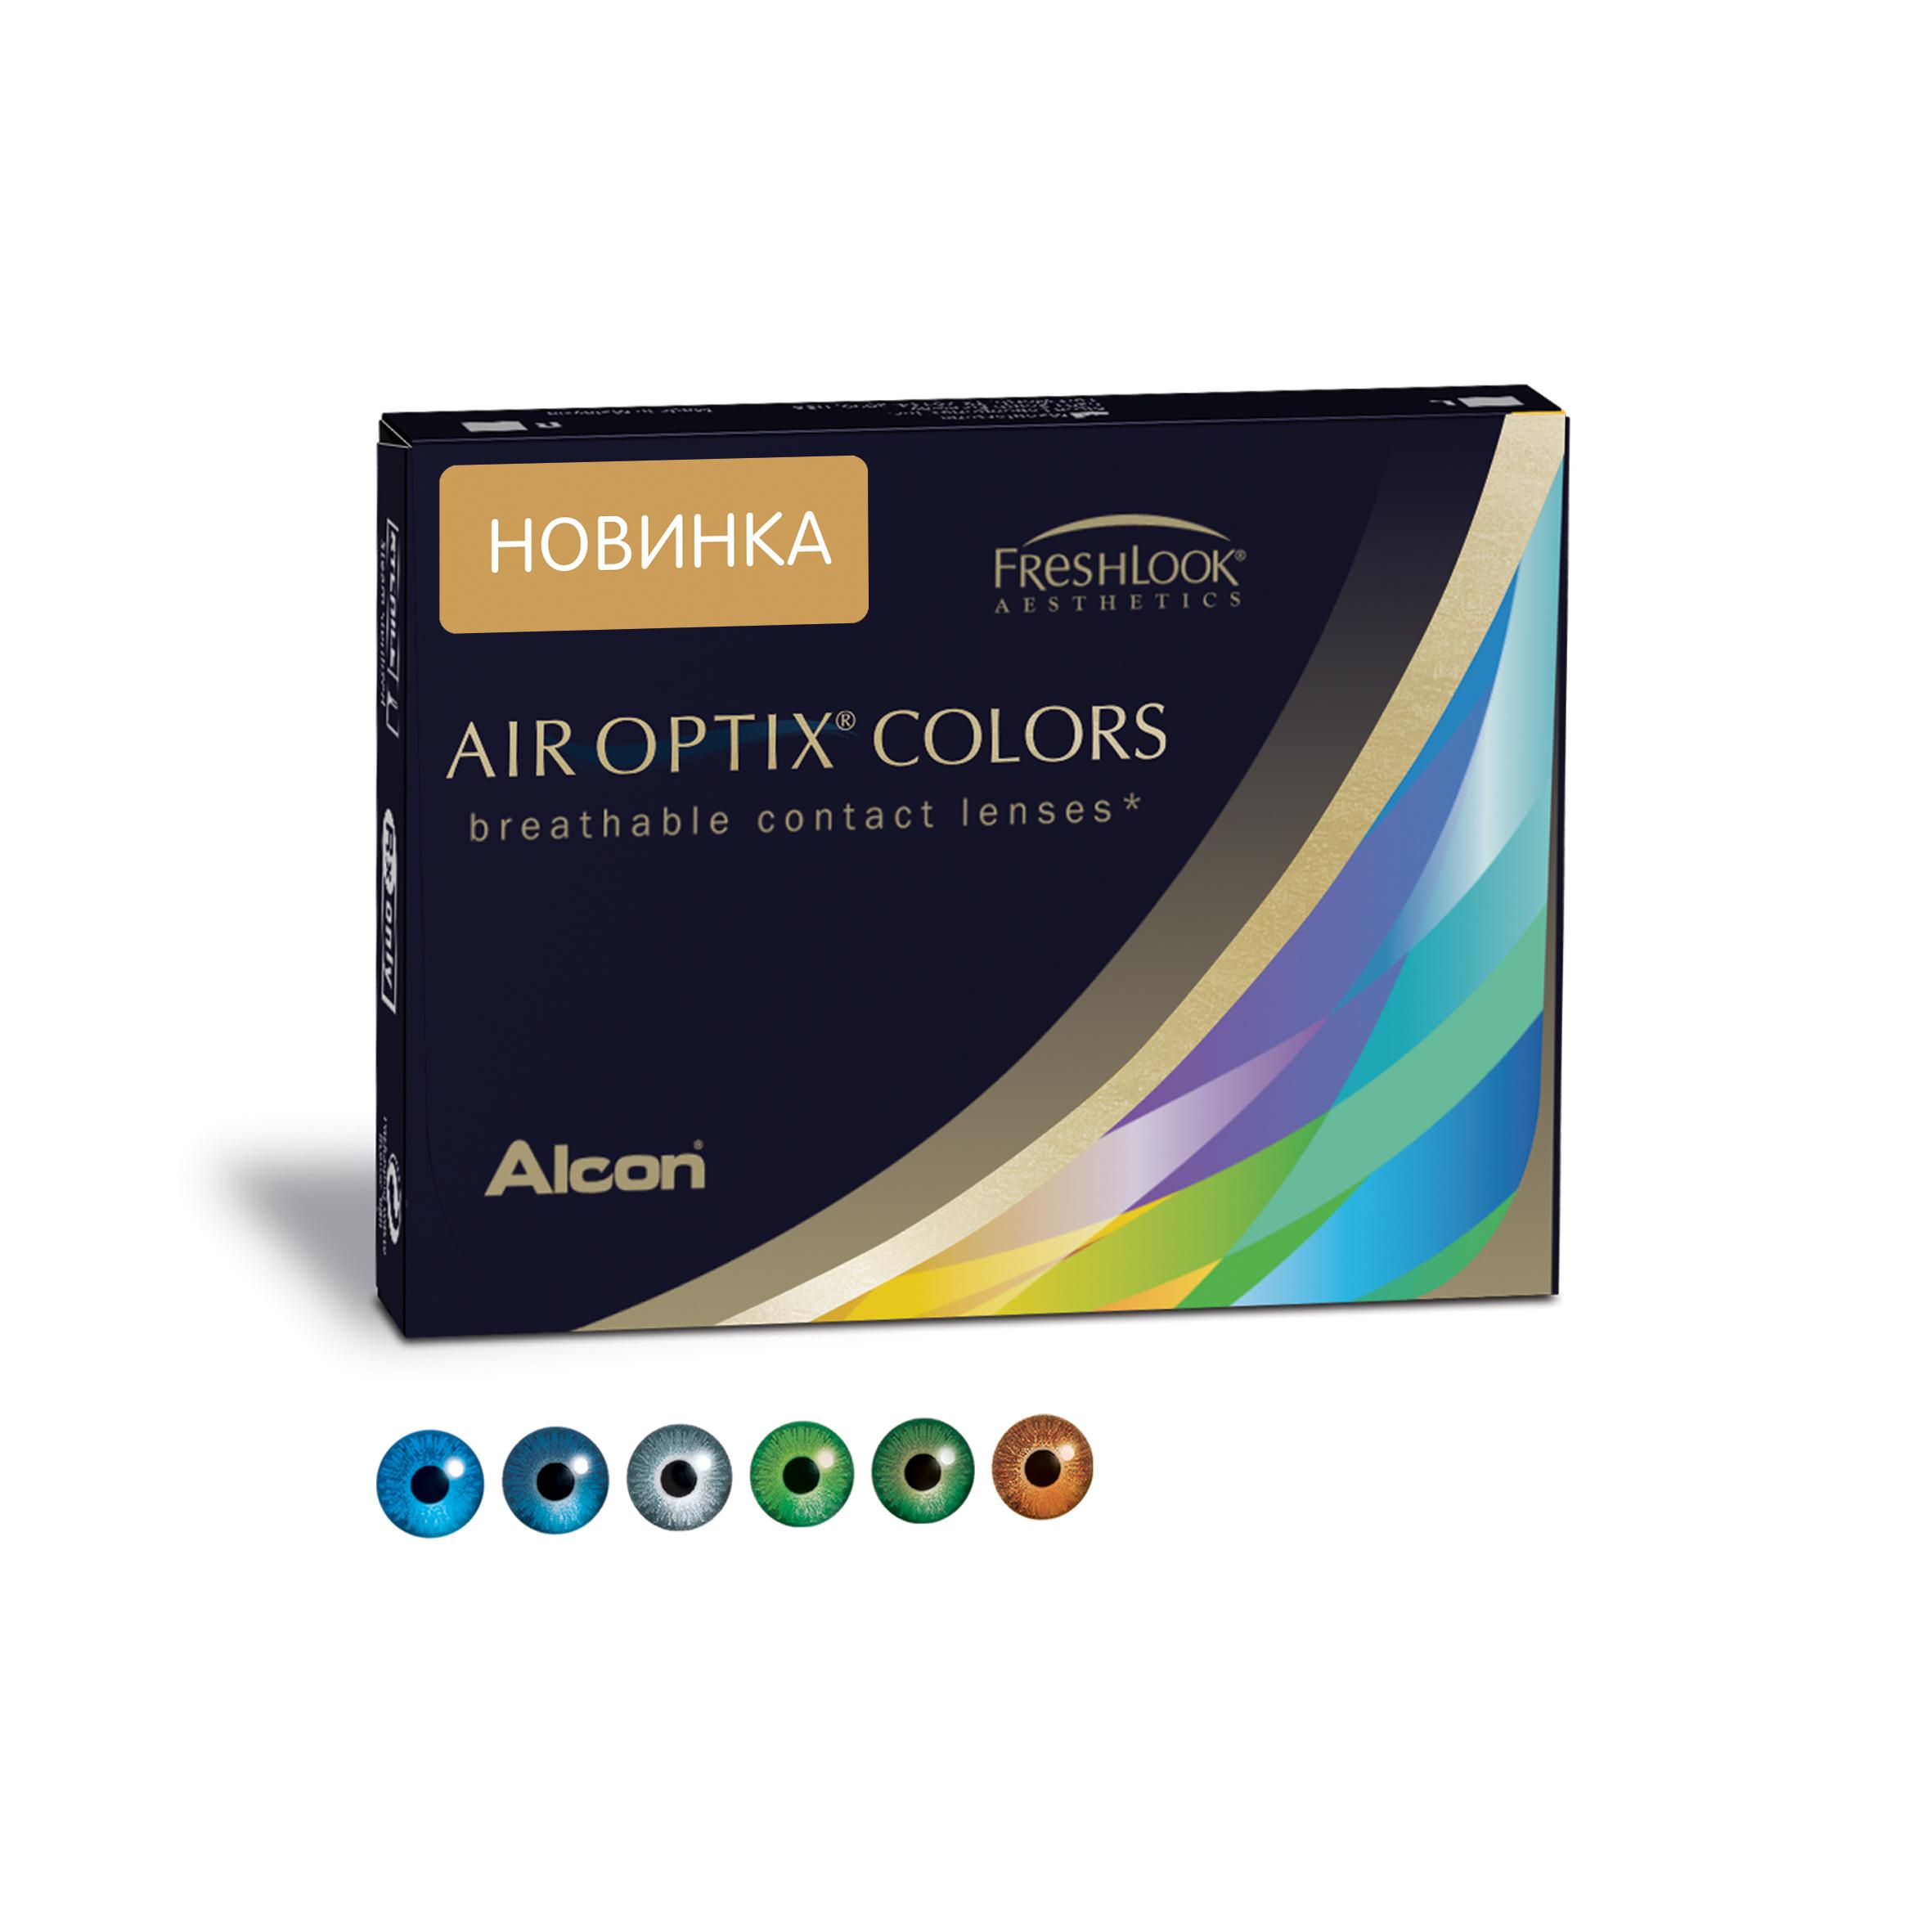 Аlcon контактные линзы Air Optix Colors 2 шт -4.50 Brilliant Blue31746248Мягкие контактные линзы